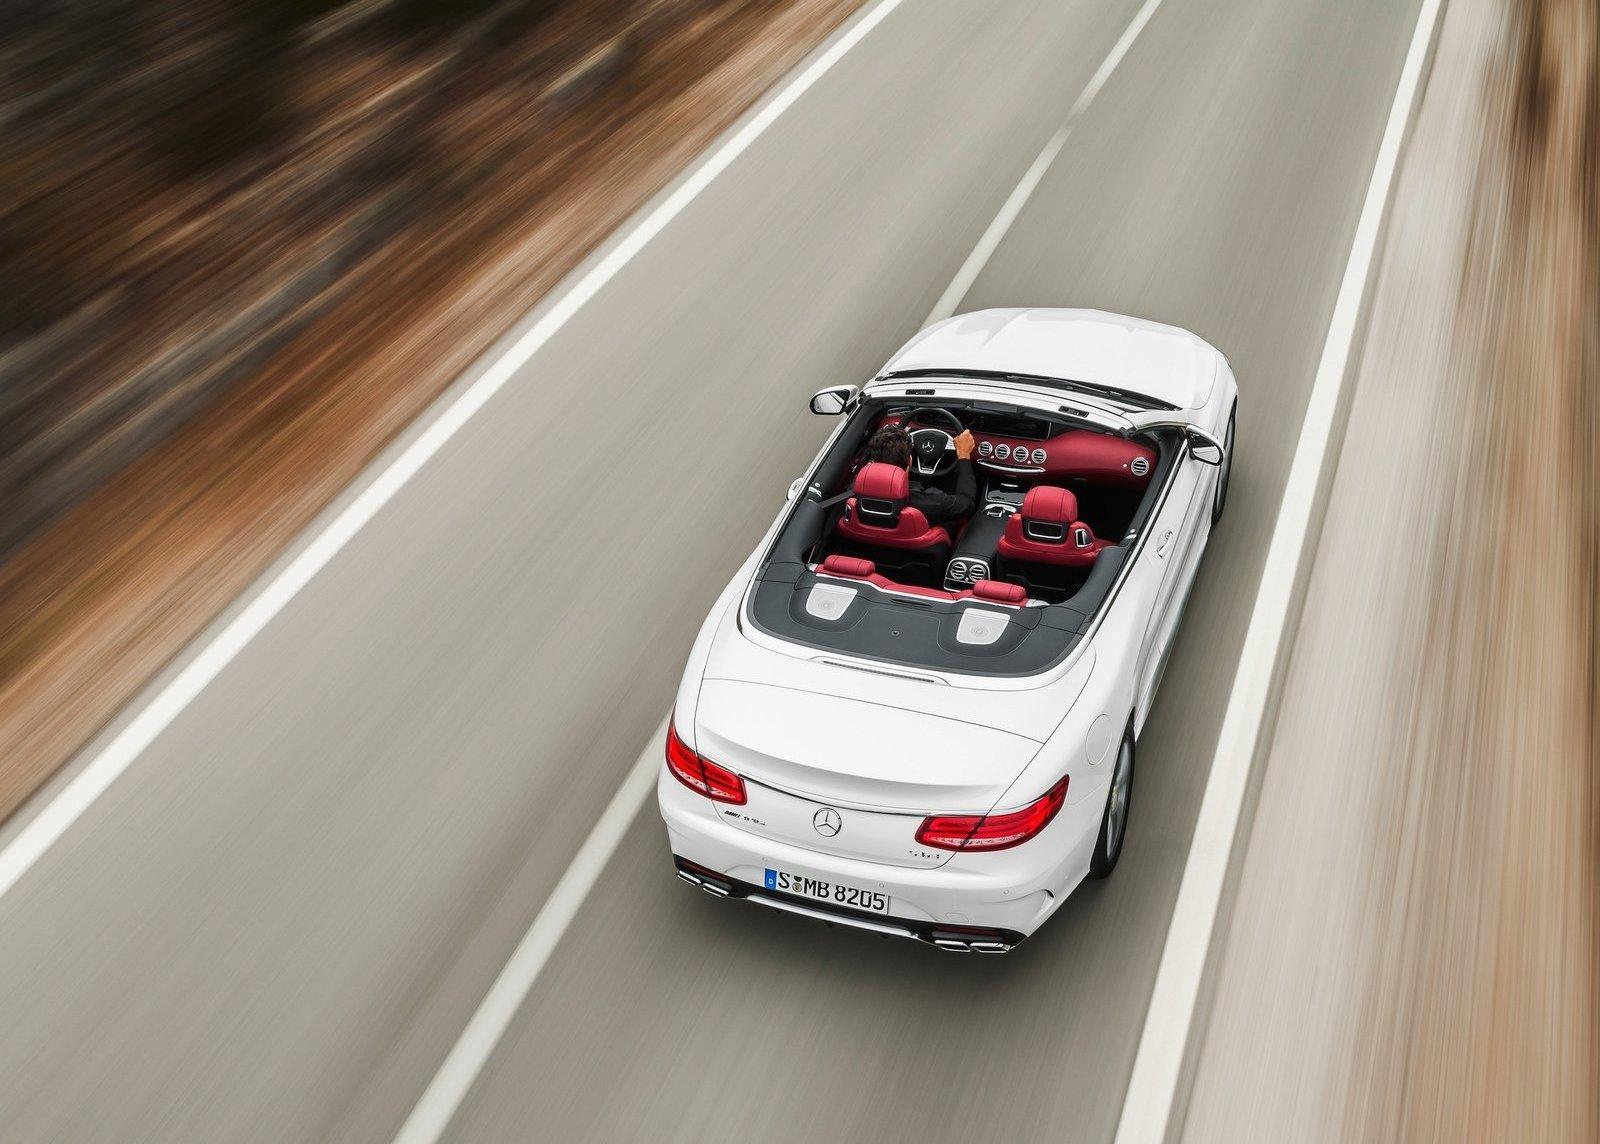 Foto de Mercedes-AMG S 63 Cabriolet (17/19)